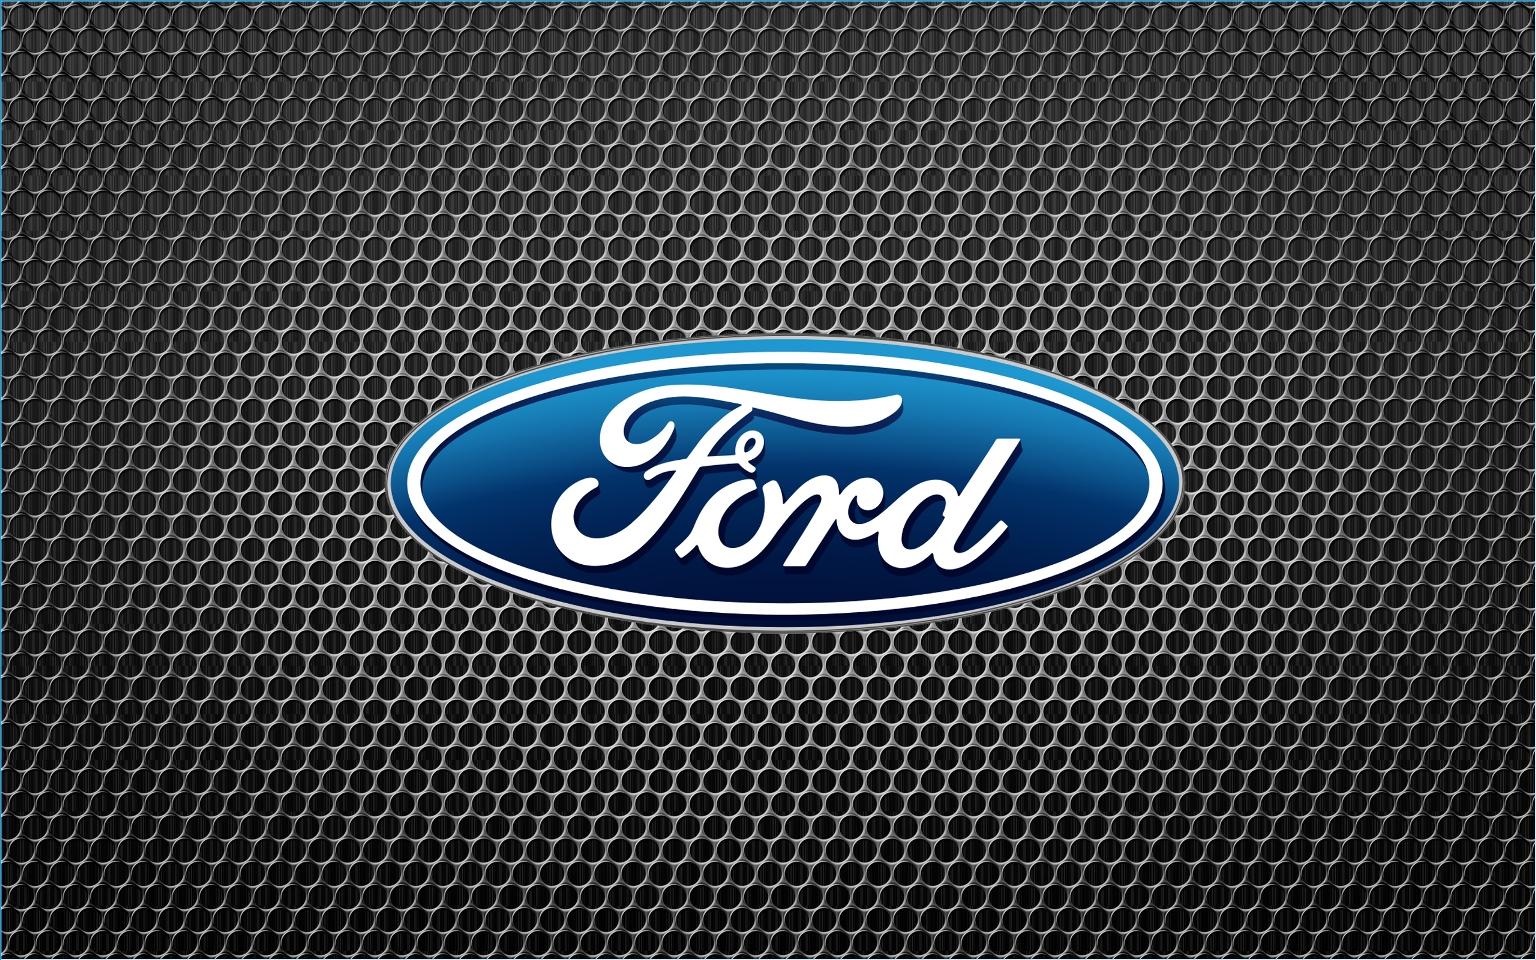 image logo ford